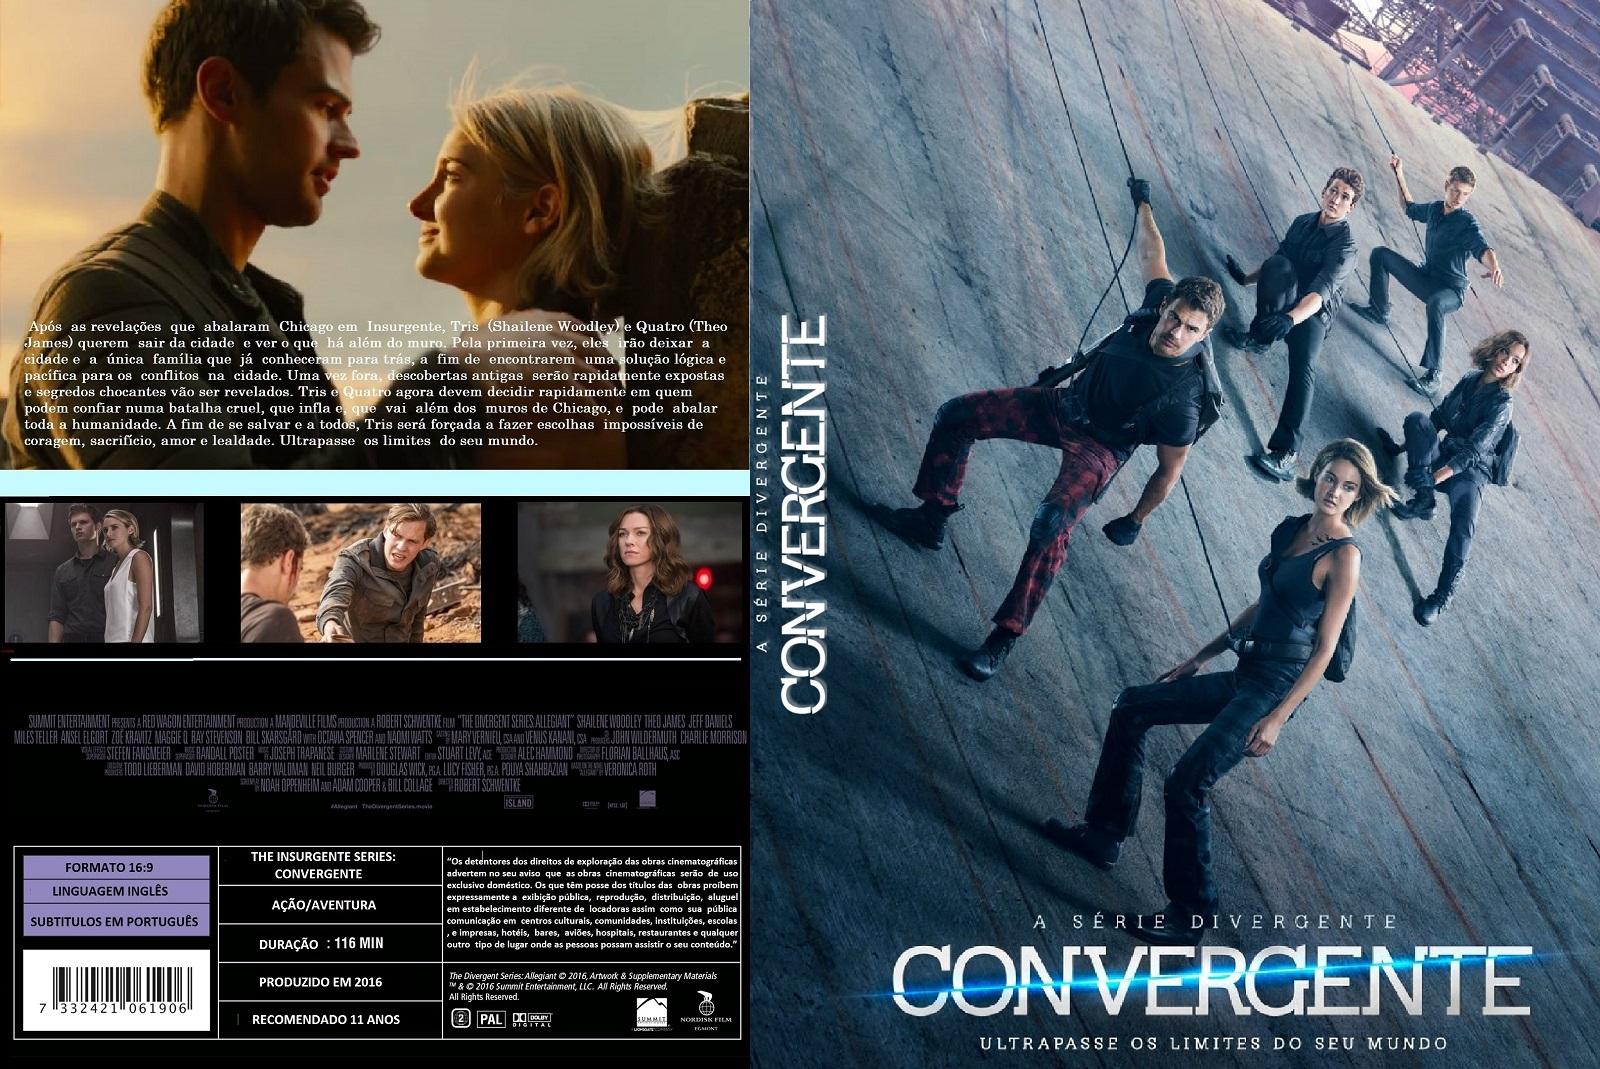 A Série Divergente Convergente DVD-R A 2BSerie 2BDivergente 2BConvergente 2B 25283 2529